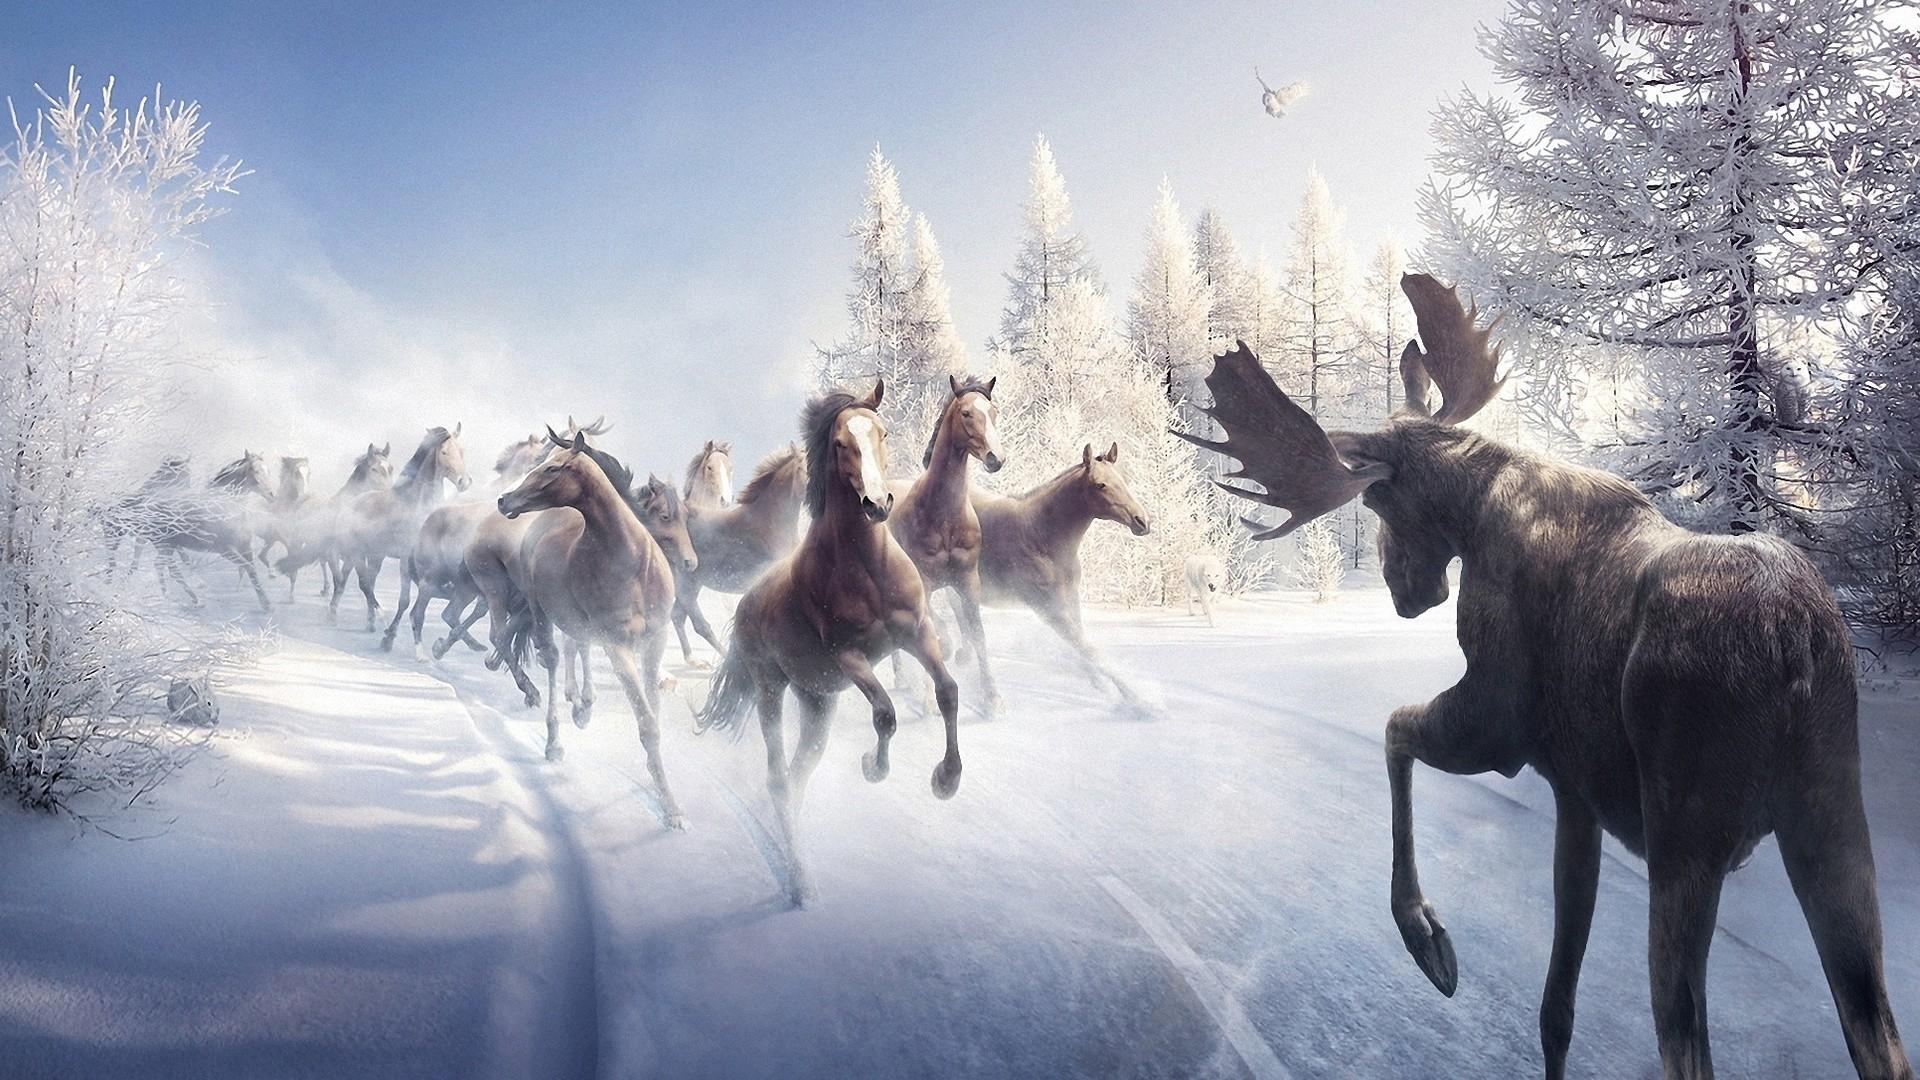 Res: 1920x1080, Horses, Christmas Tree, Snow, Winter, Road, Bird, Elk